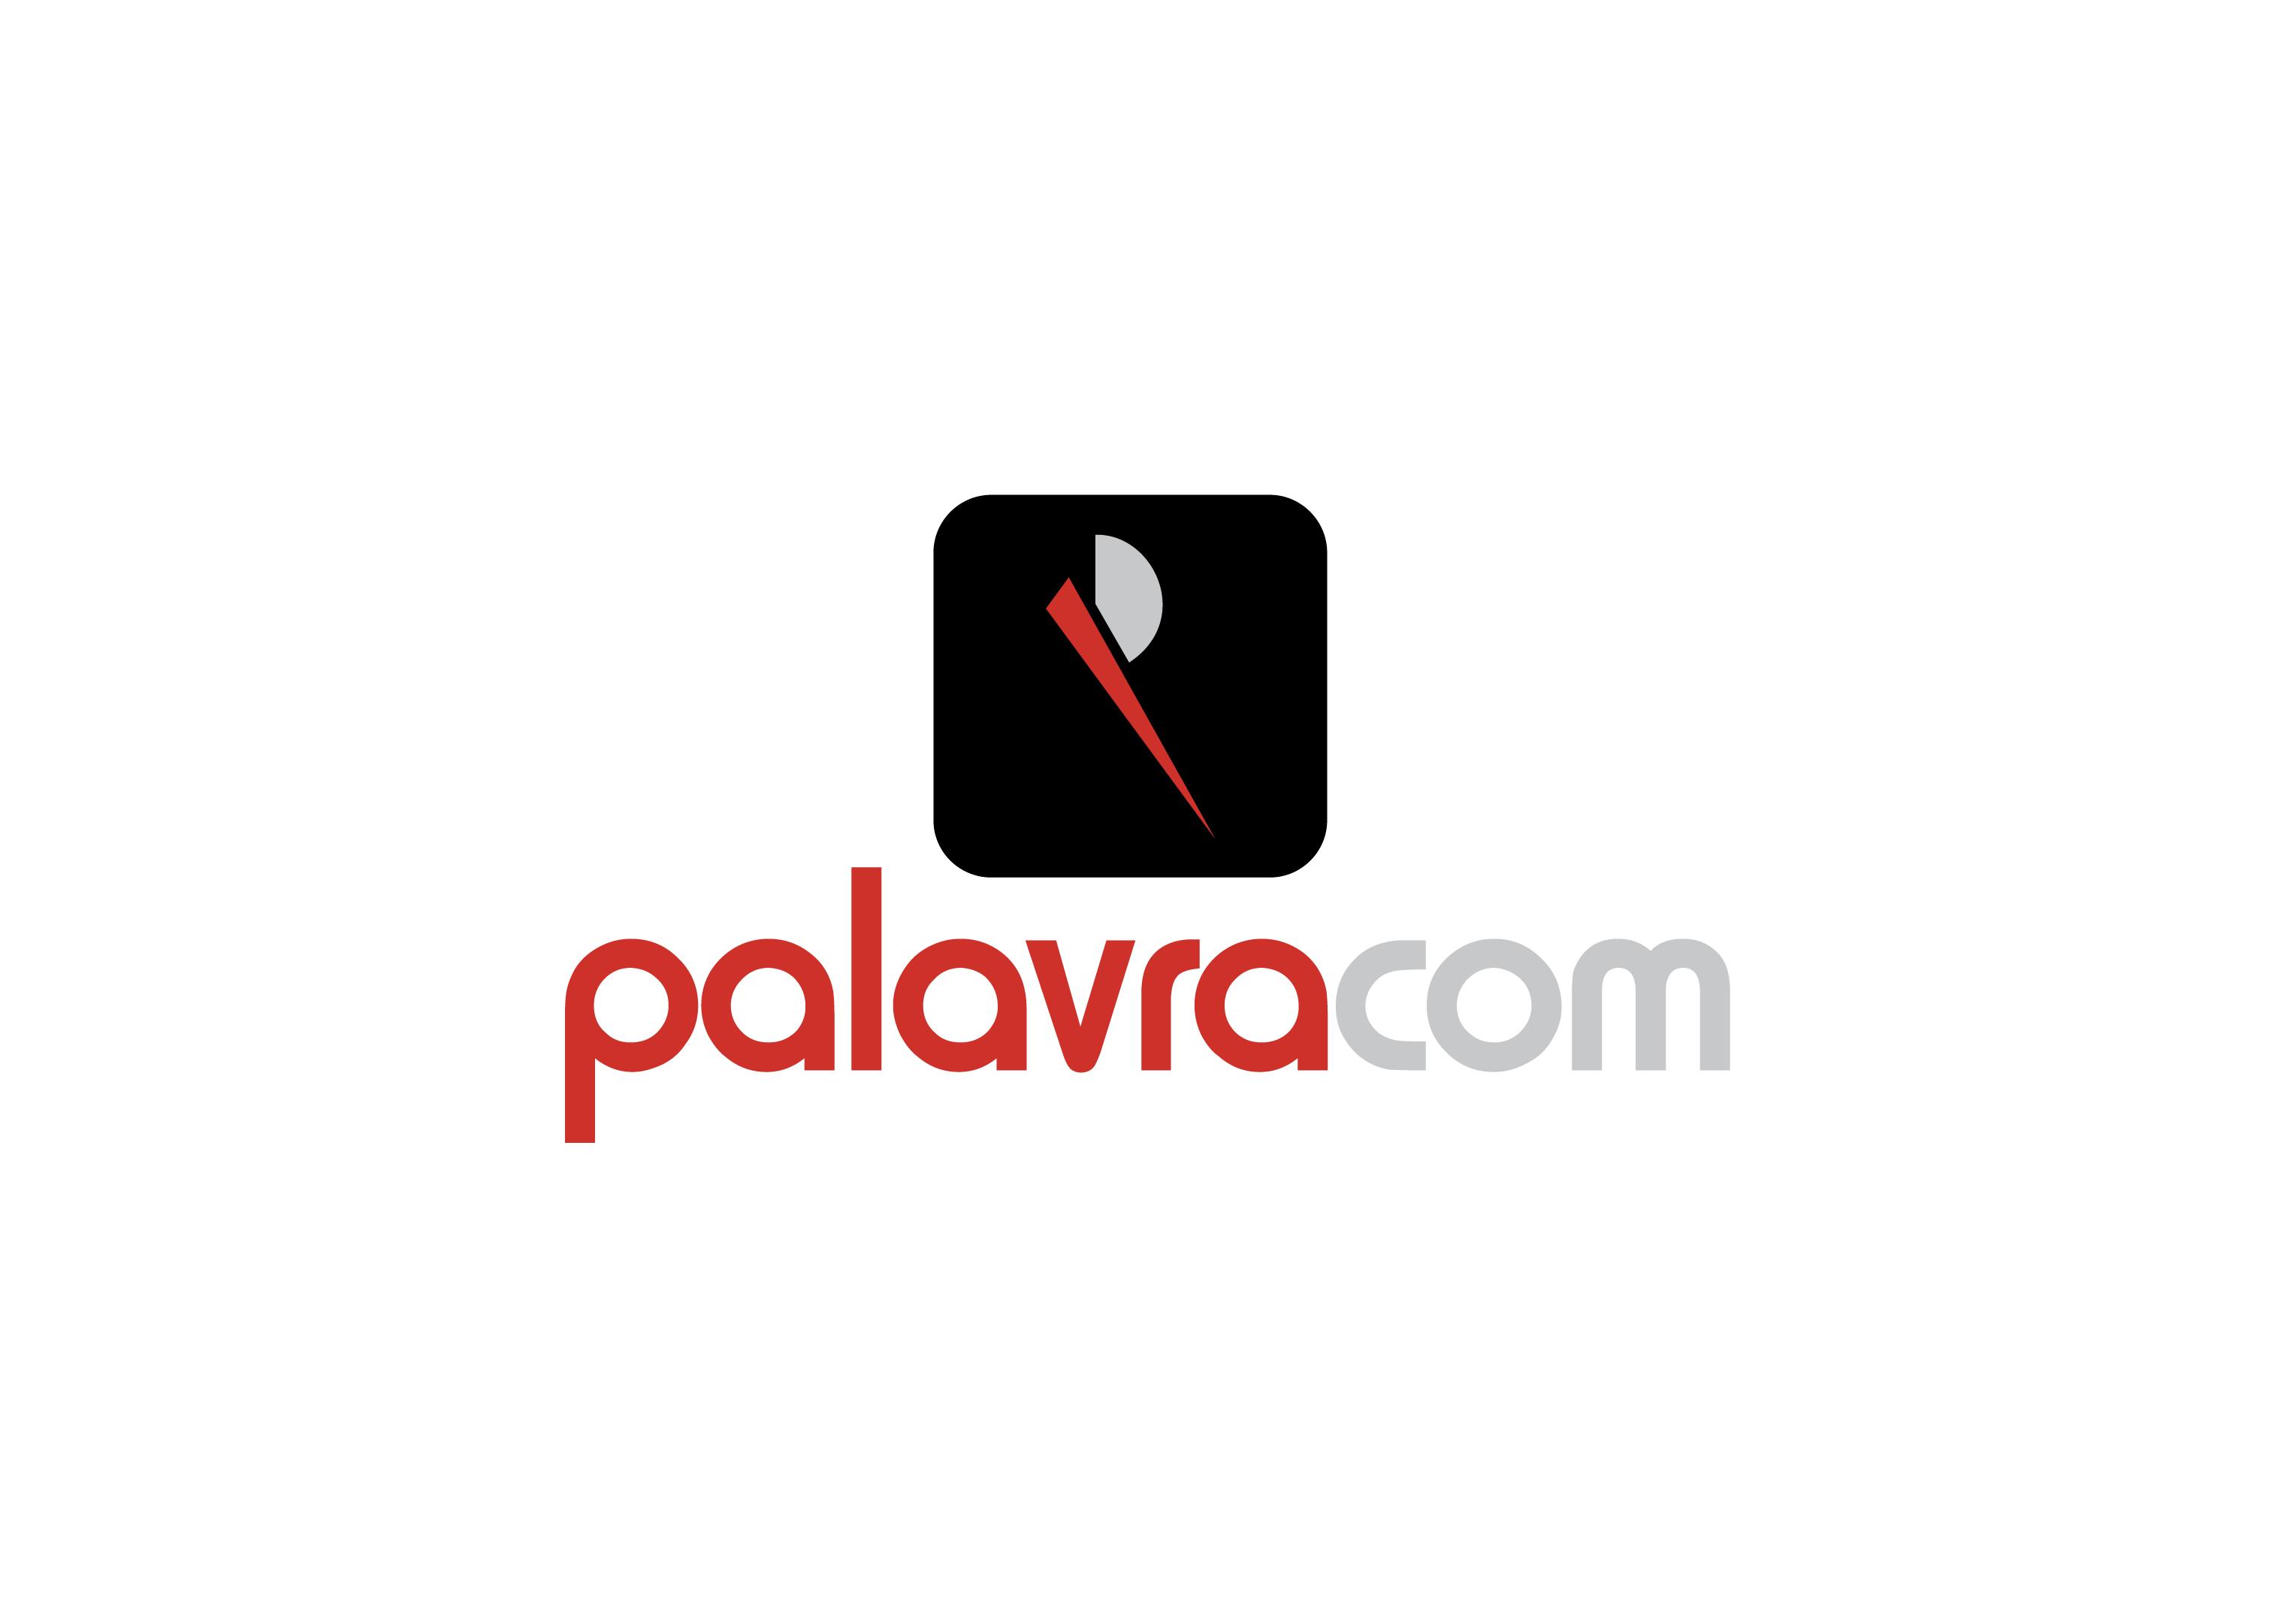 Logotipo AABI PalavraCom